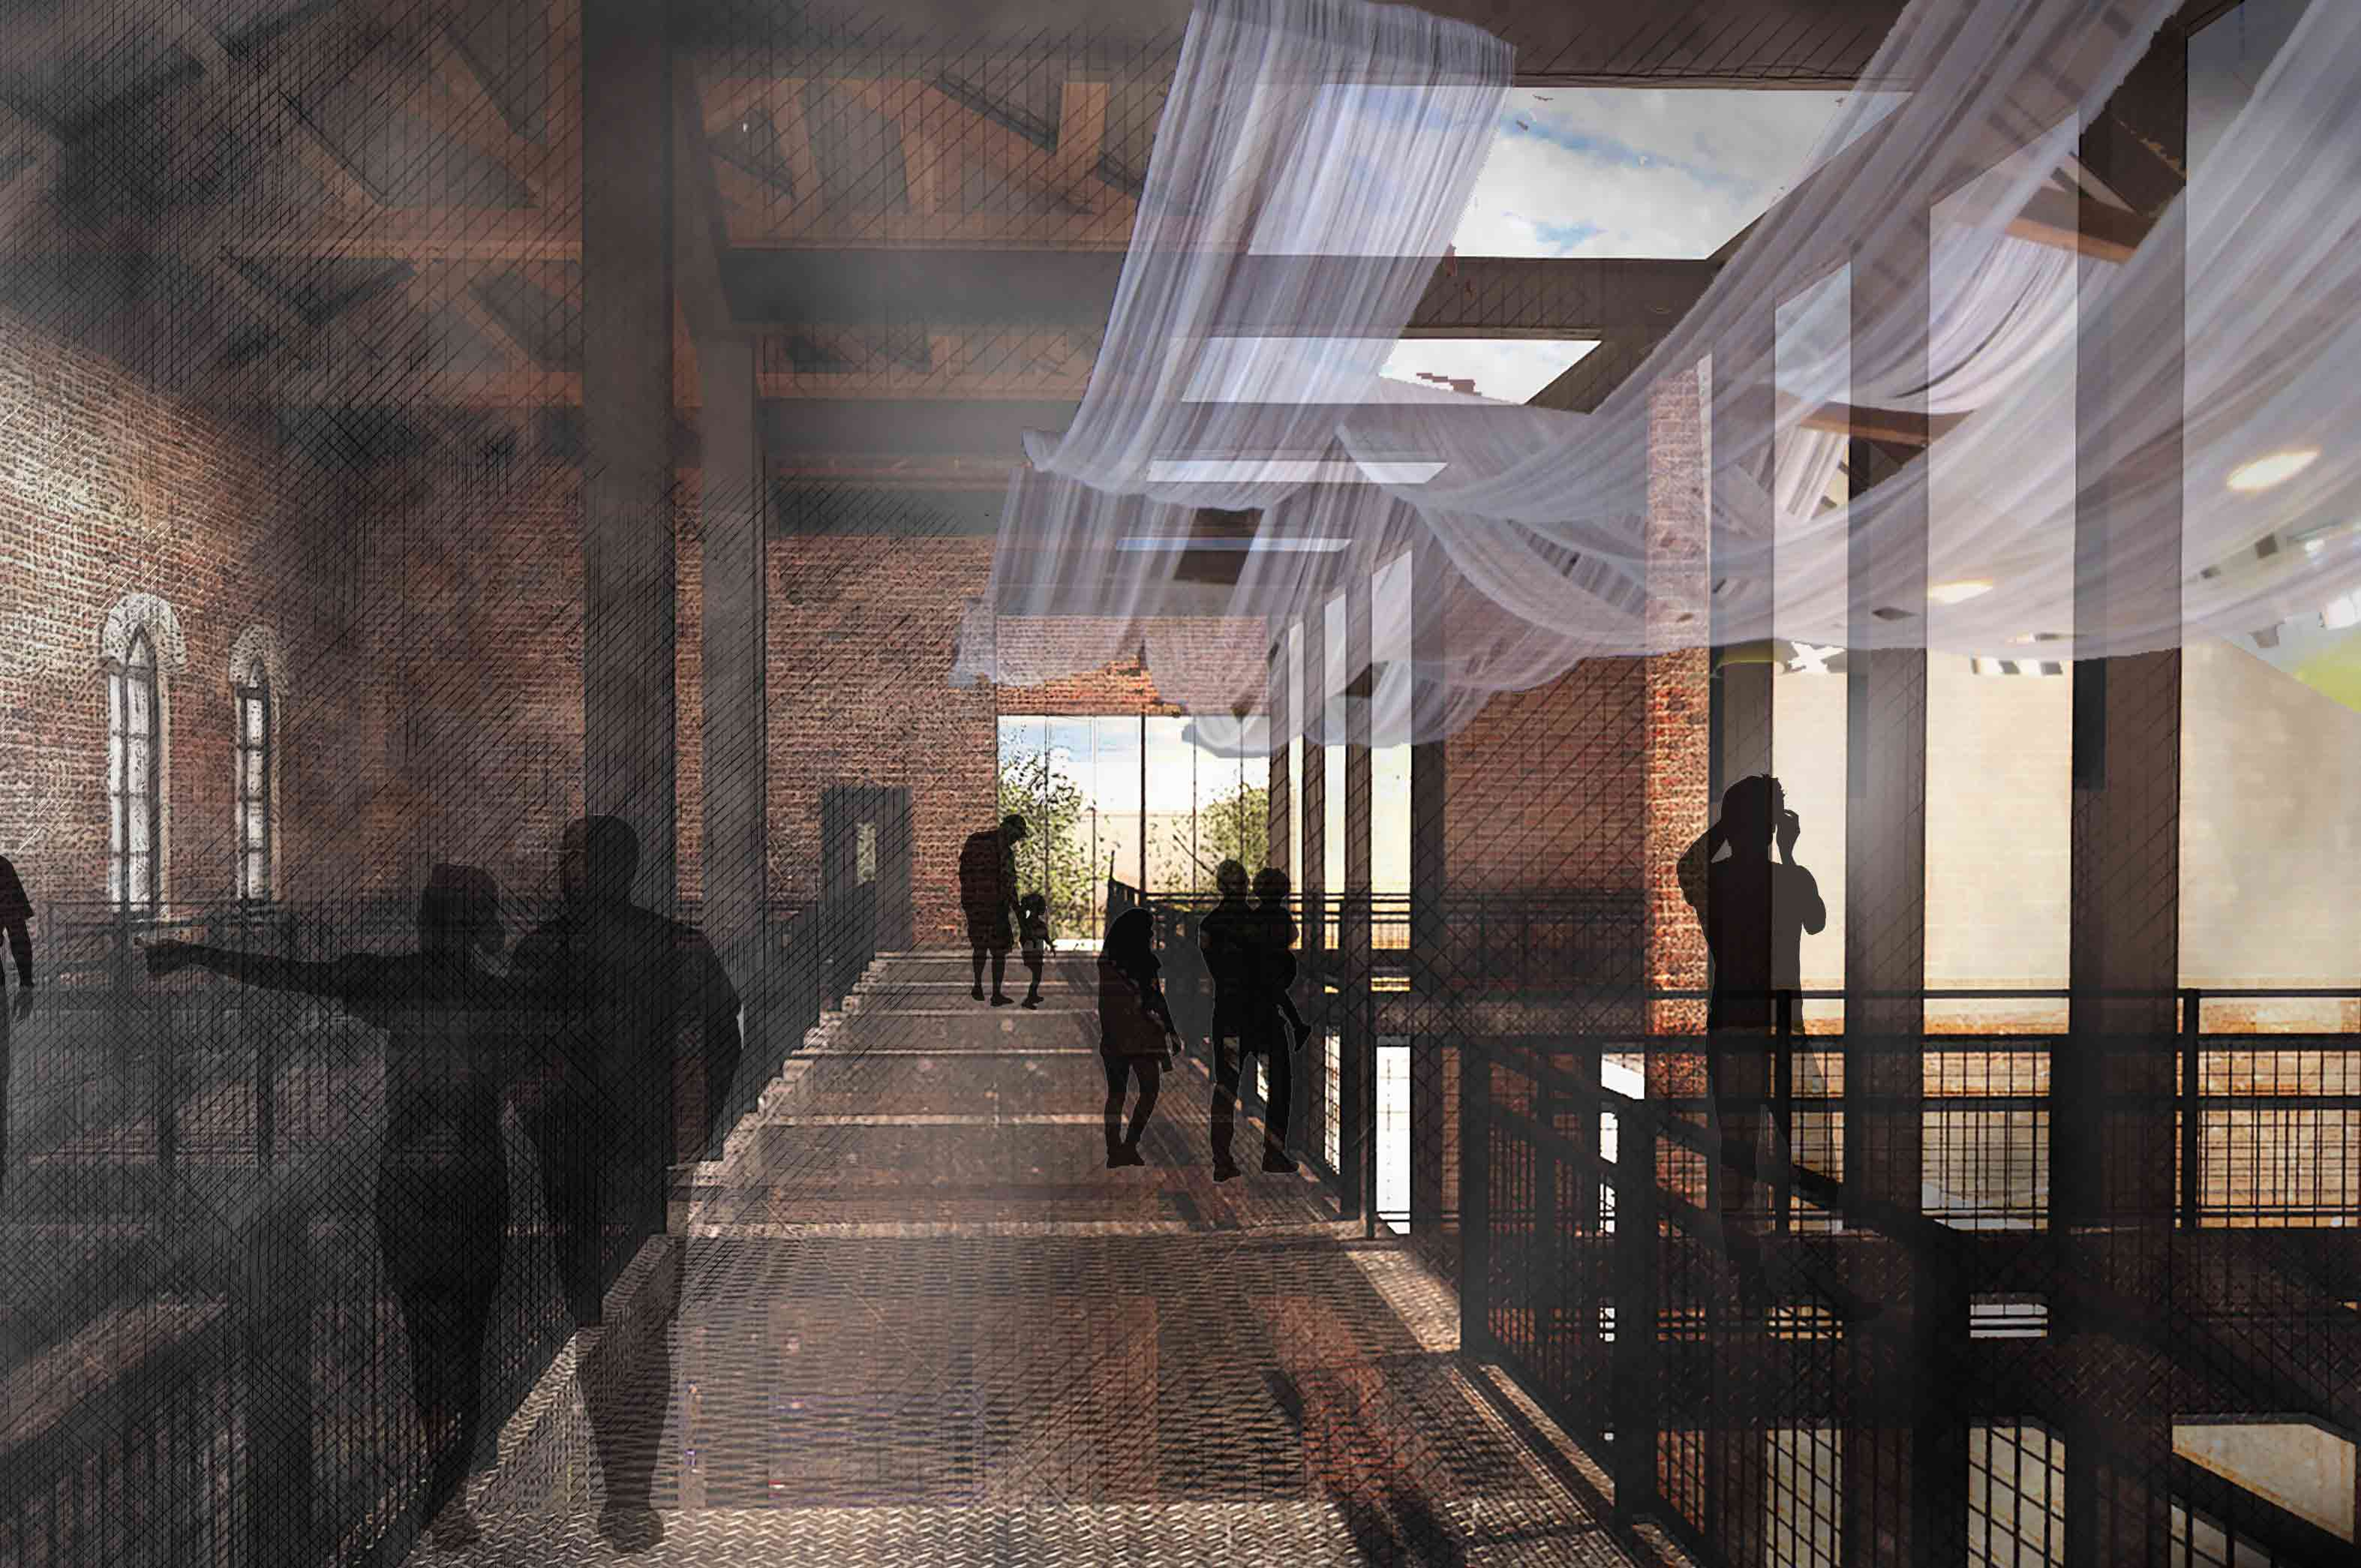 Hannah Astbury, BArch (Hons) Architecture, 2019